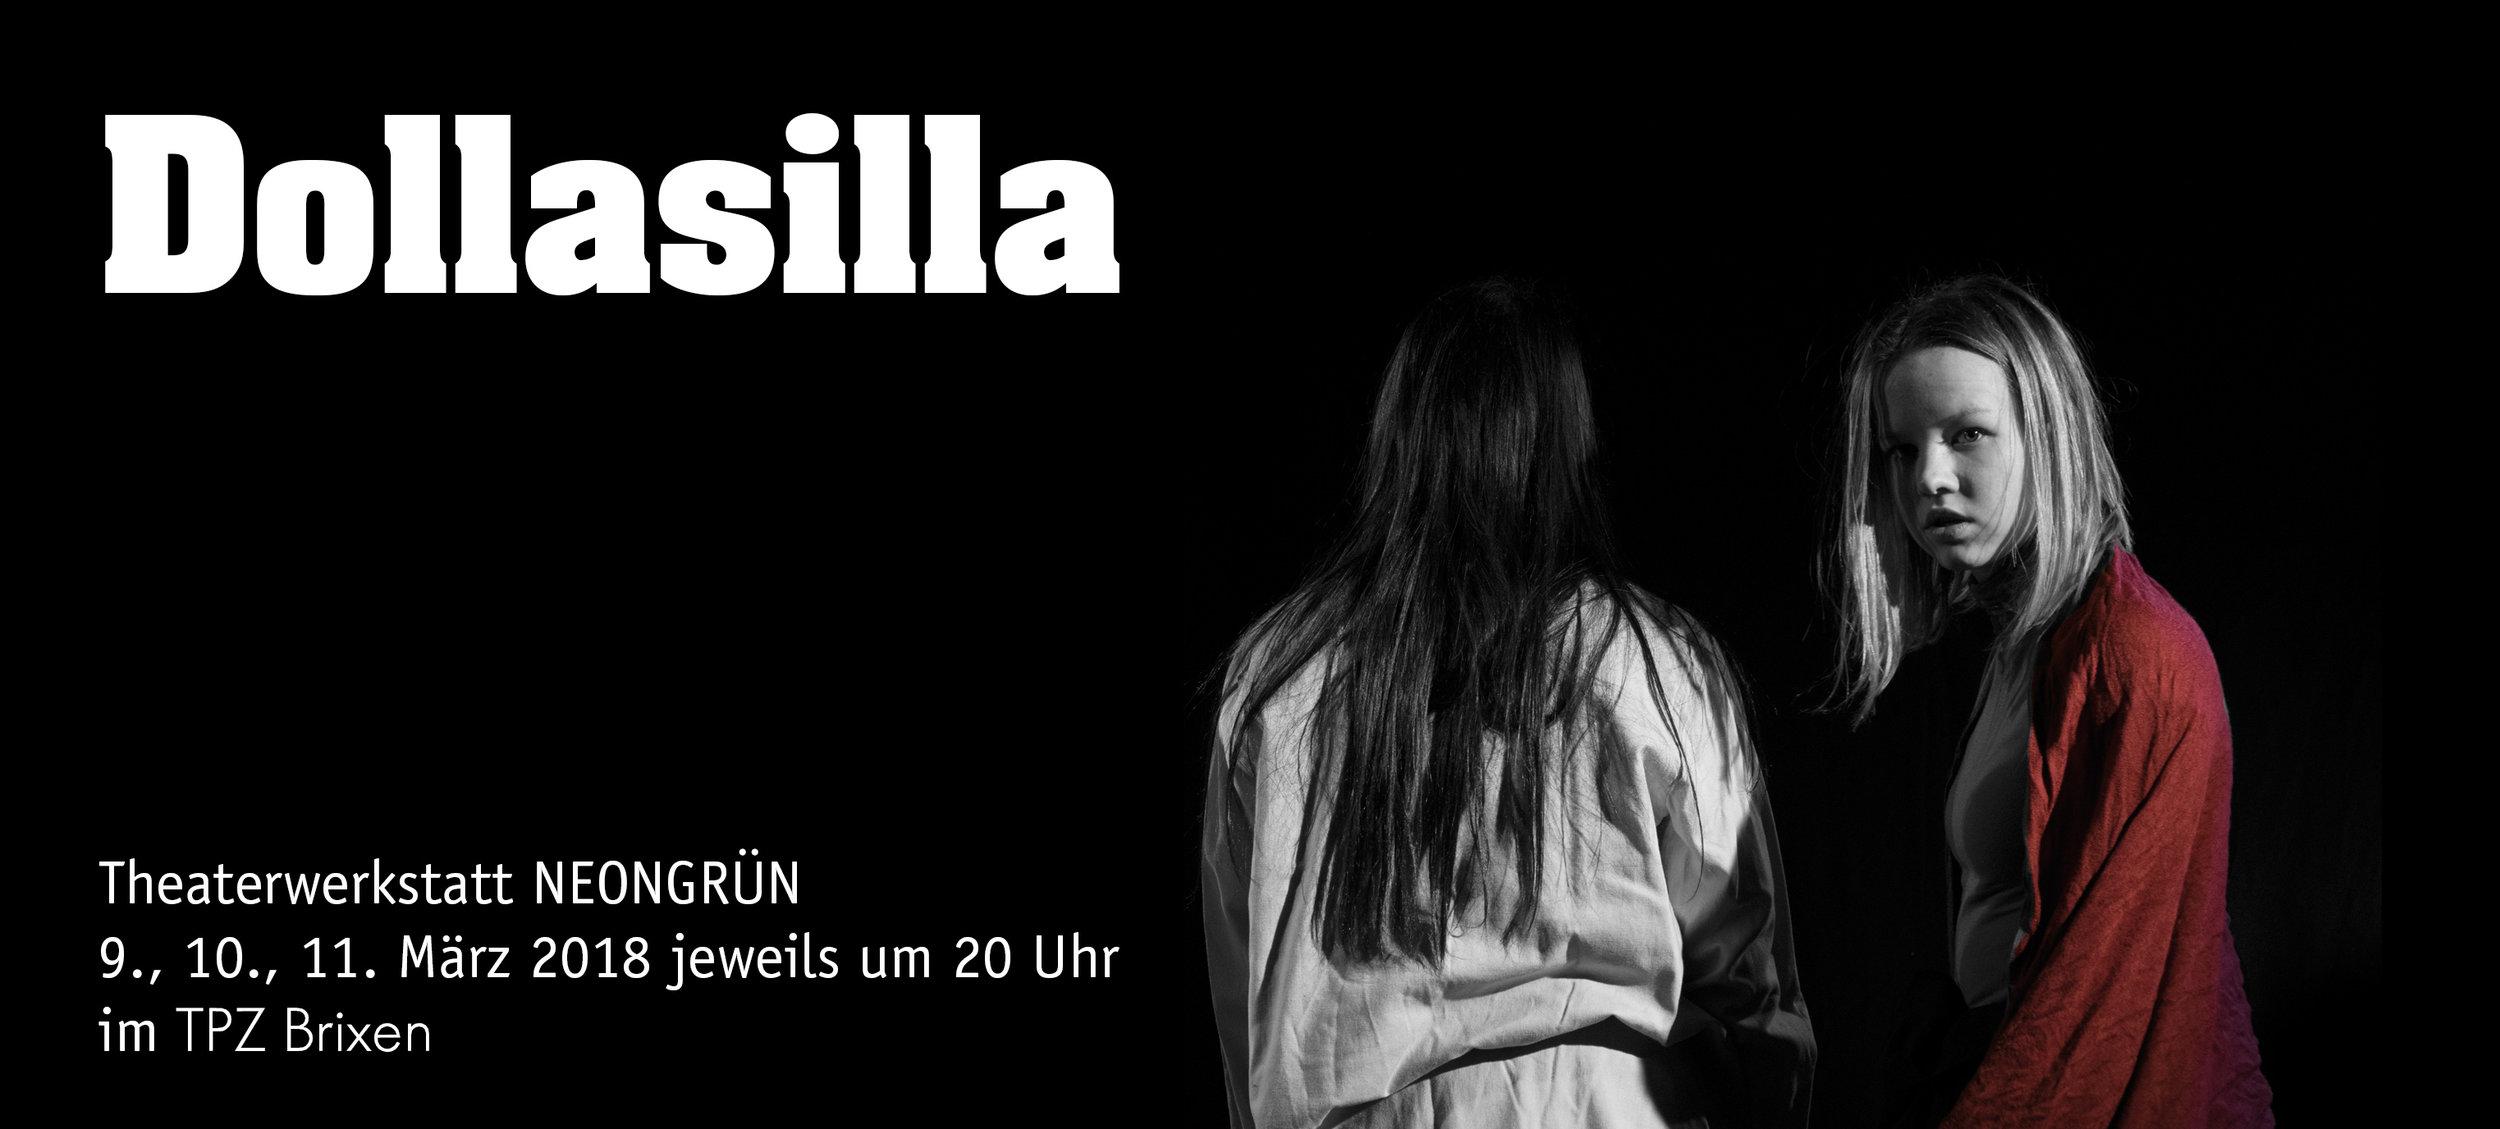 2018 neongrün Dollasilla Slider WS.jpg